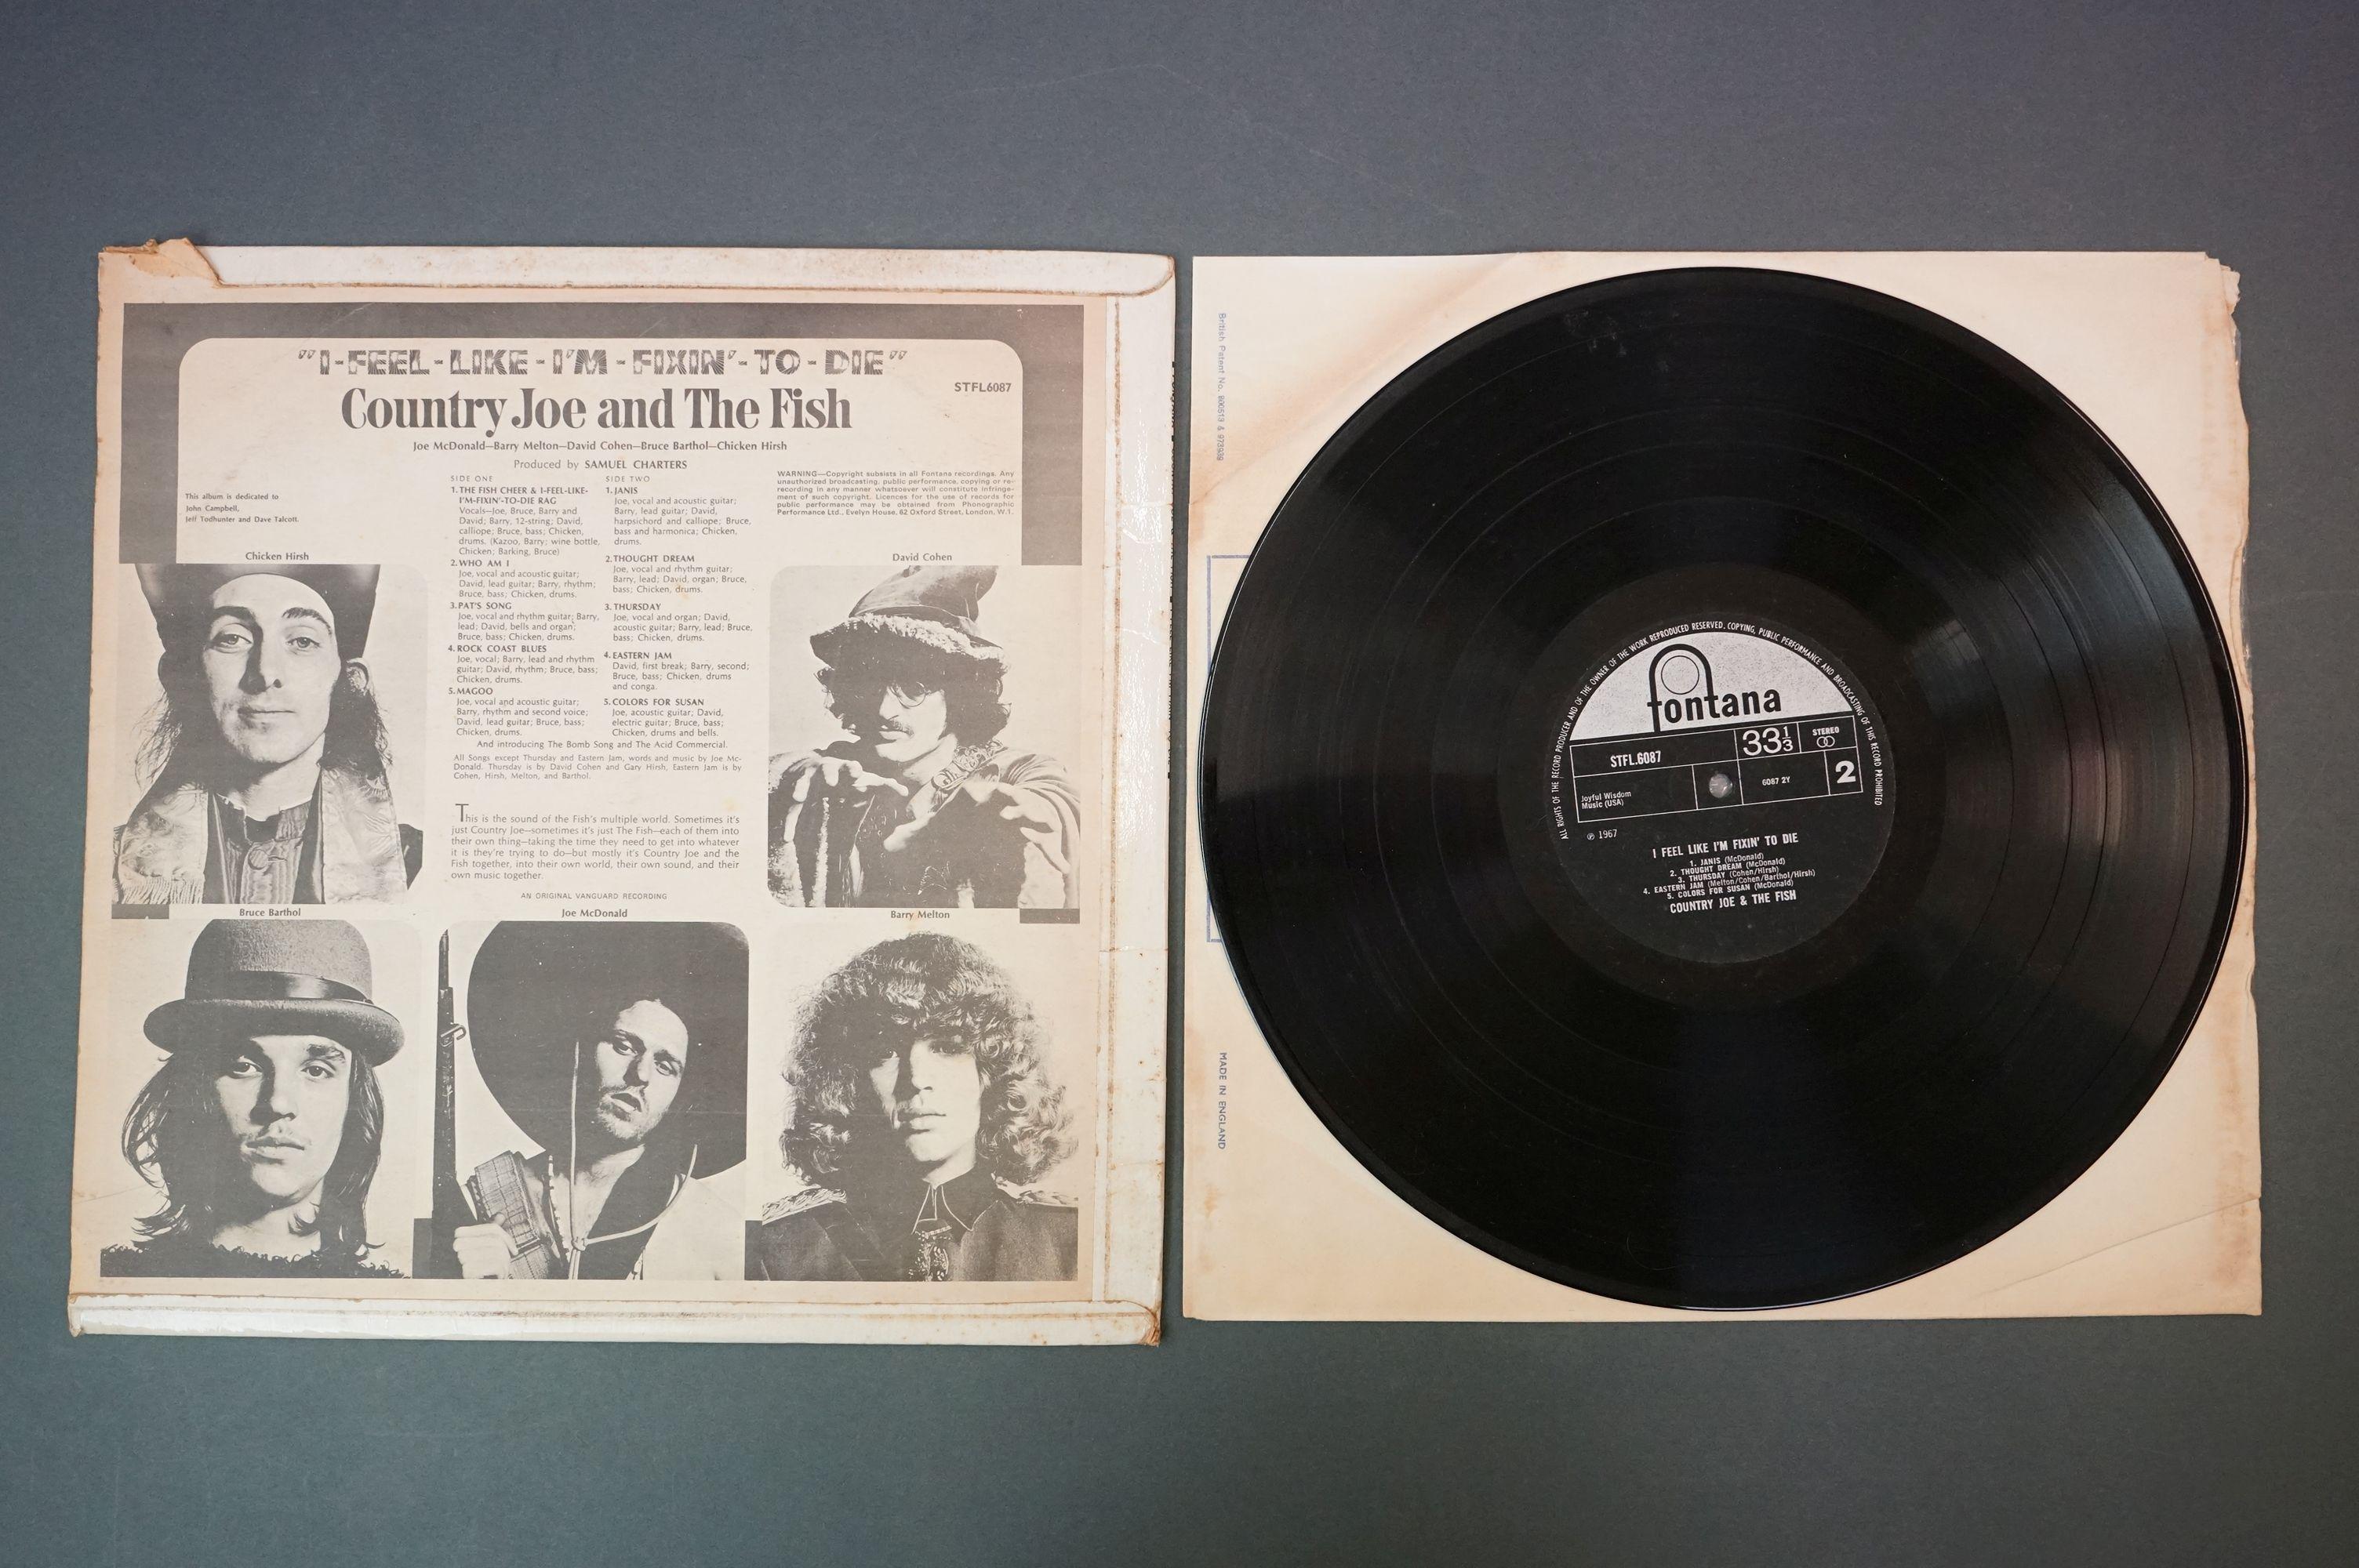 Vinyl - Country Joe and The Fish, I Feel Like I'm Fixin' To Die, Fontana STFL 6087, flip back - Image 3 of 4